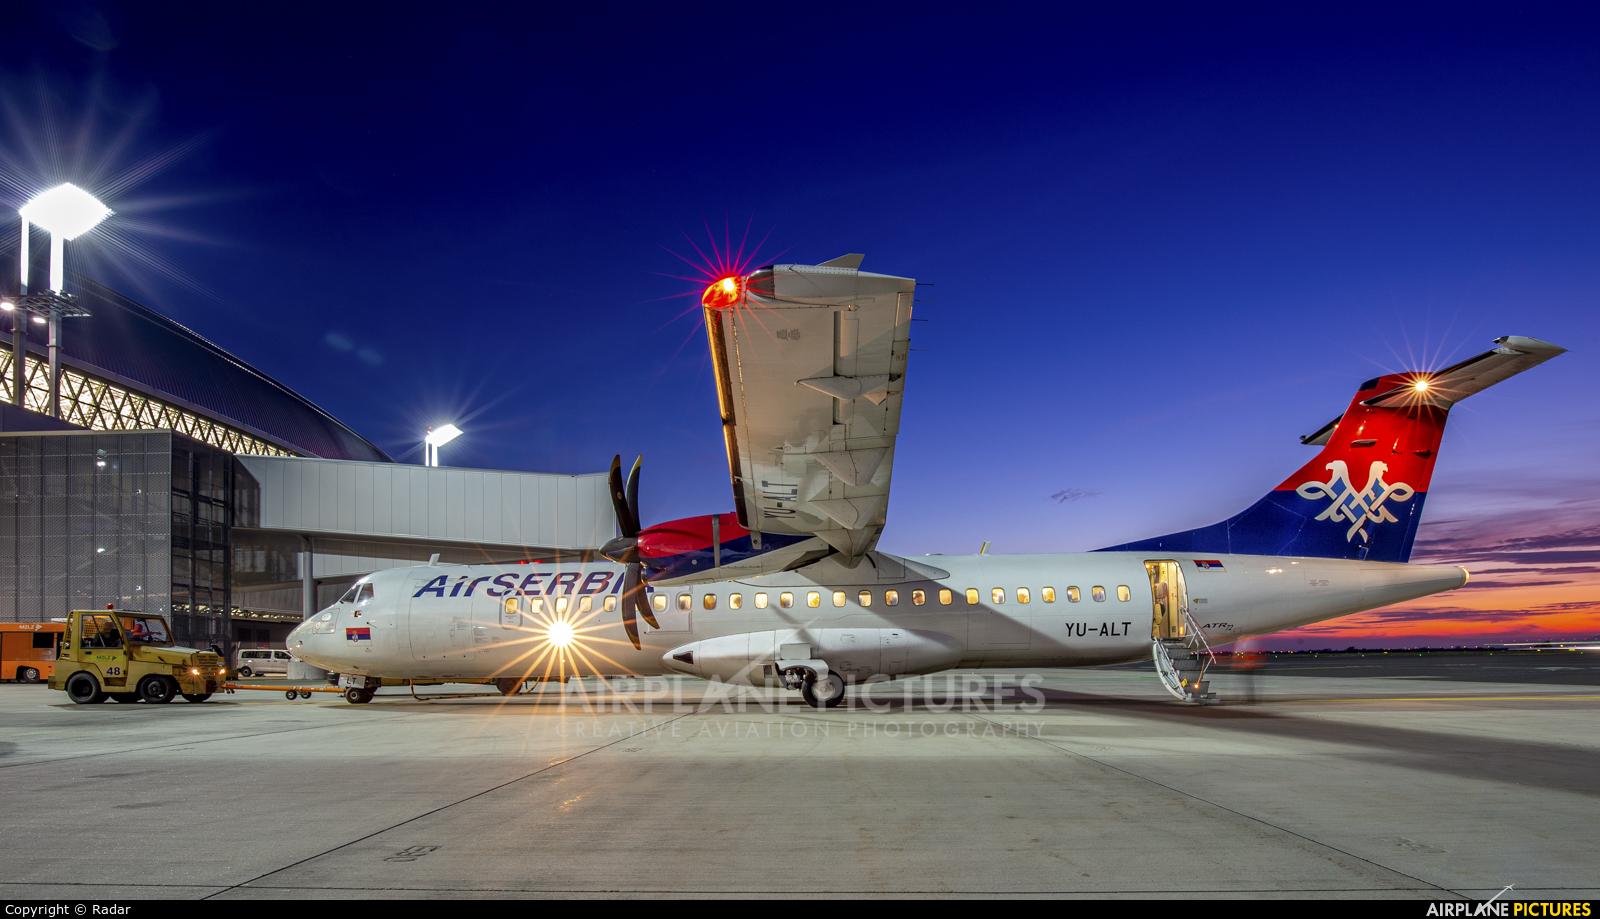 Air Serbia YU-ALT aircraft at Zagreb